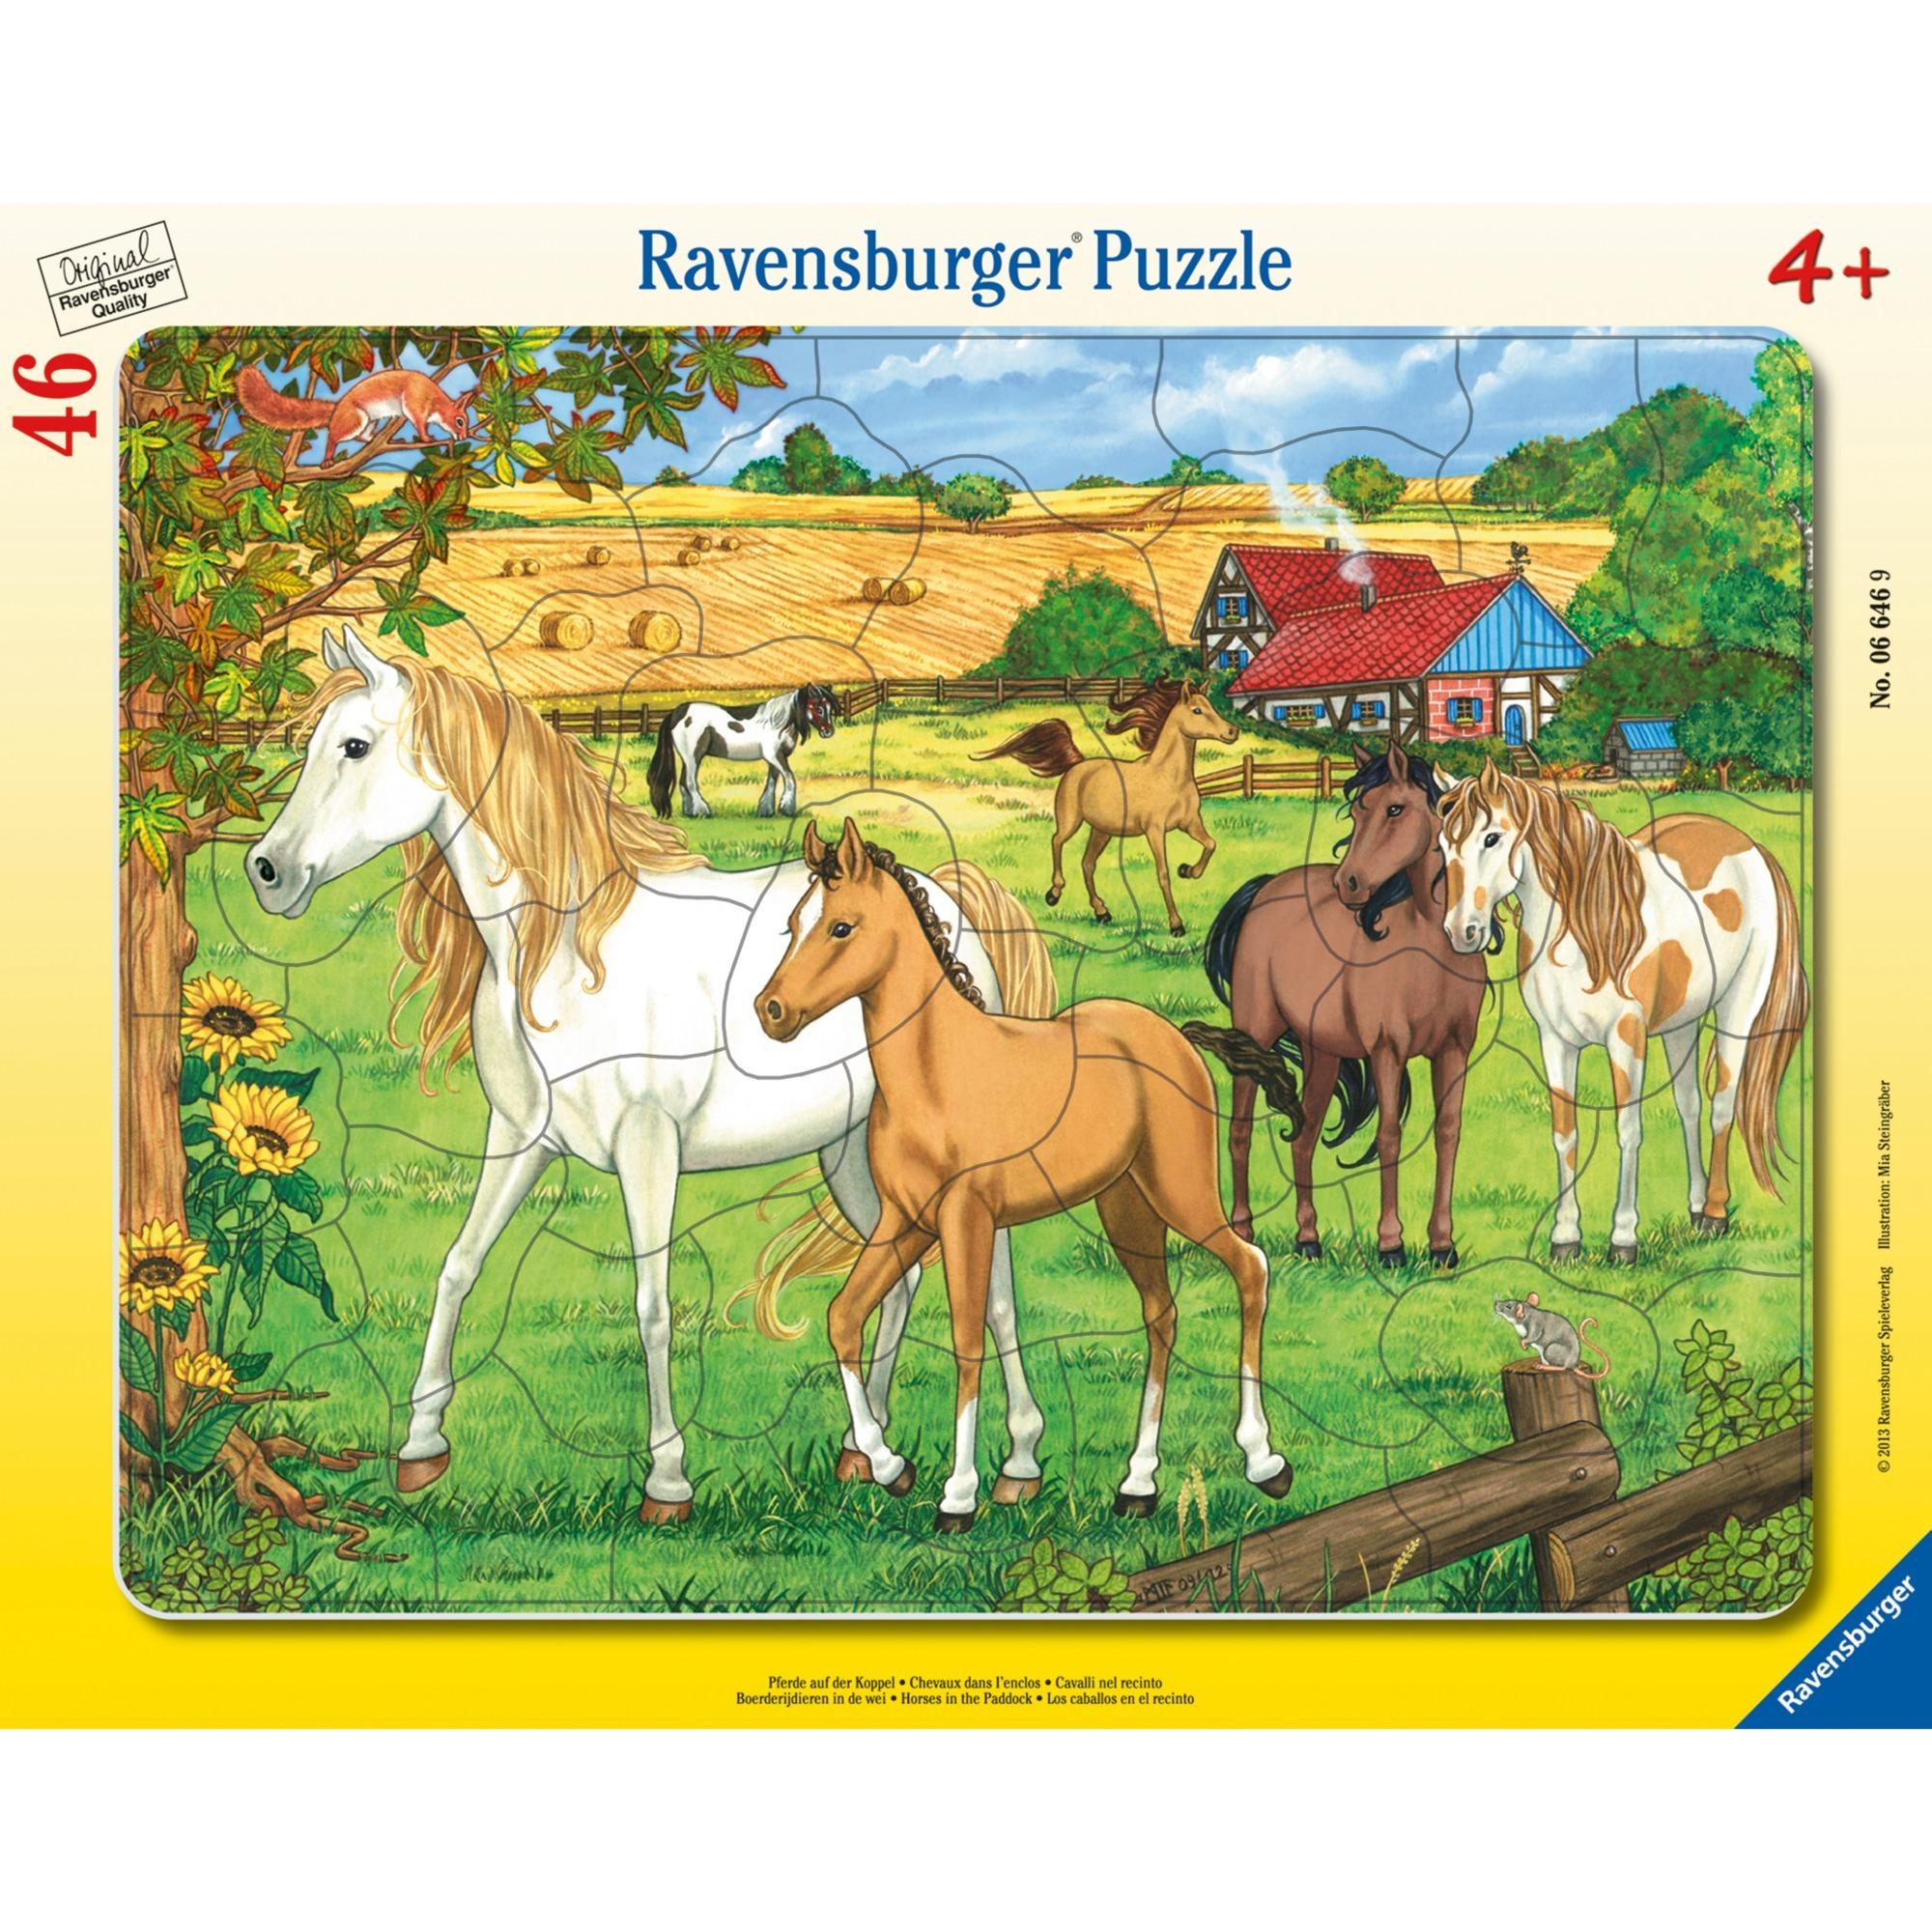 00.006.646 puzzle 46 pieza(s)